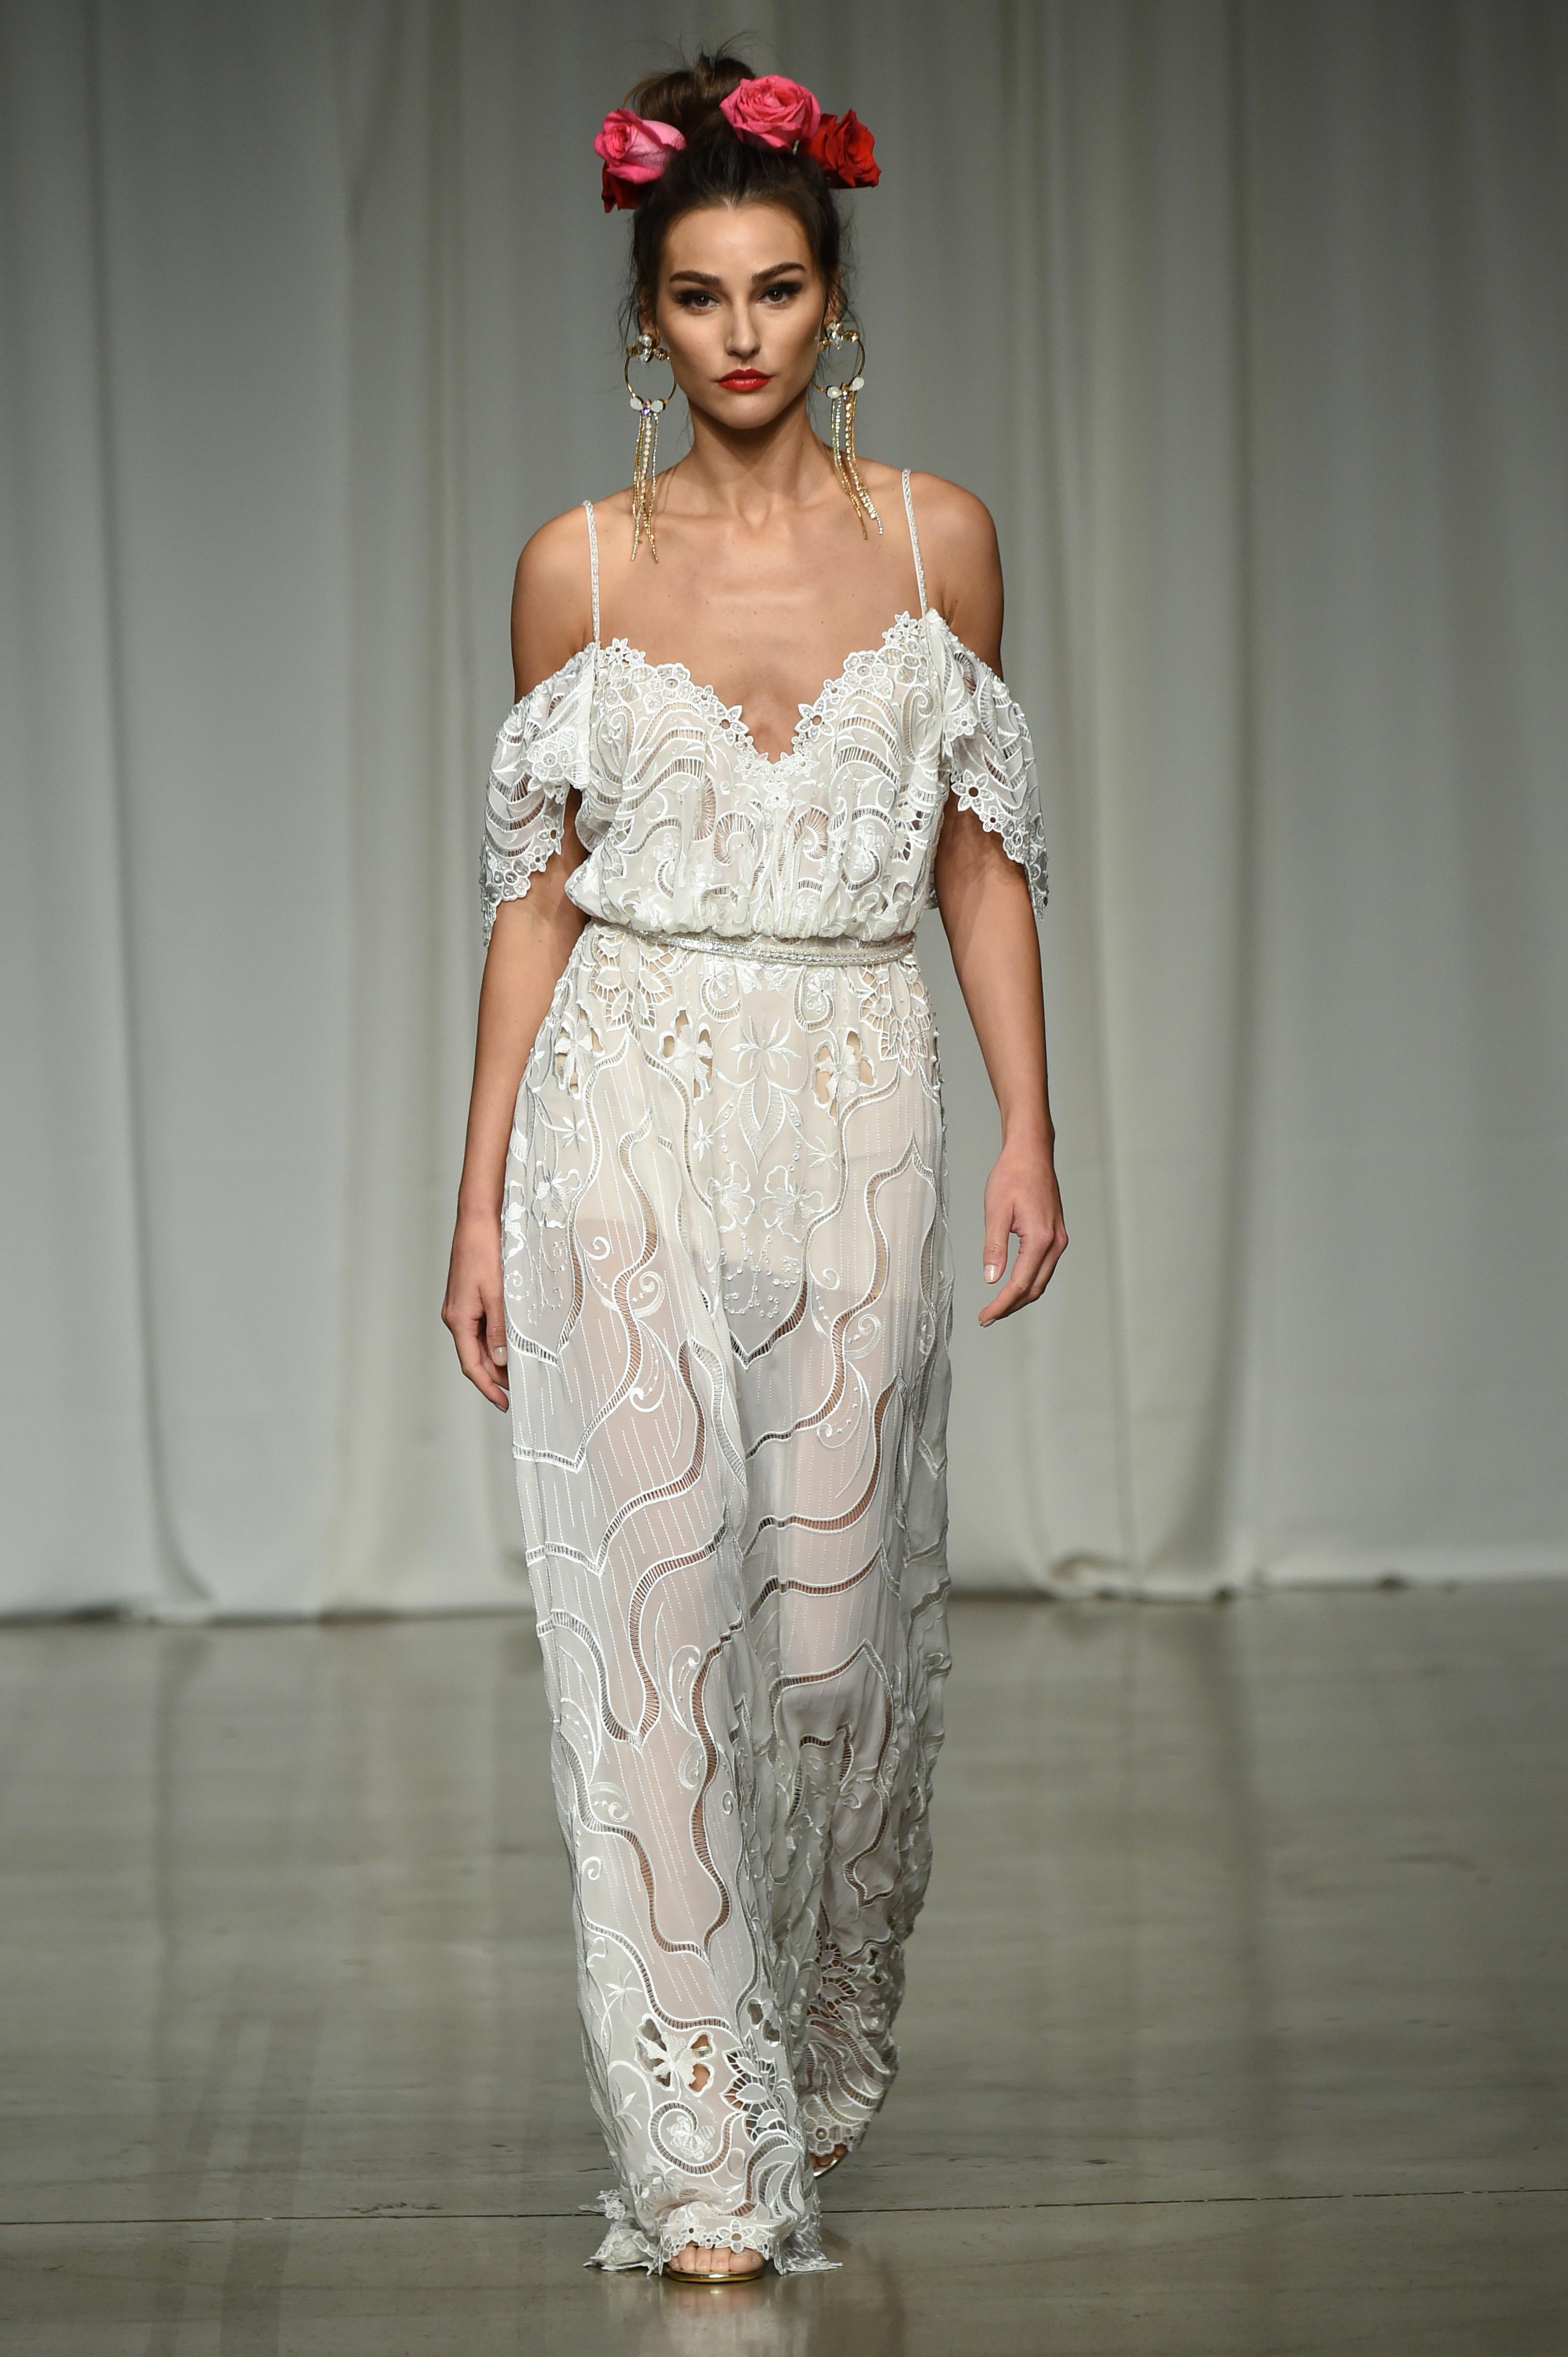 julie vino group fall 2019 over the shoulder spaghetti strap sheer wedding dress